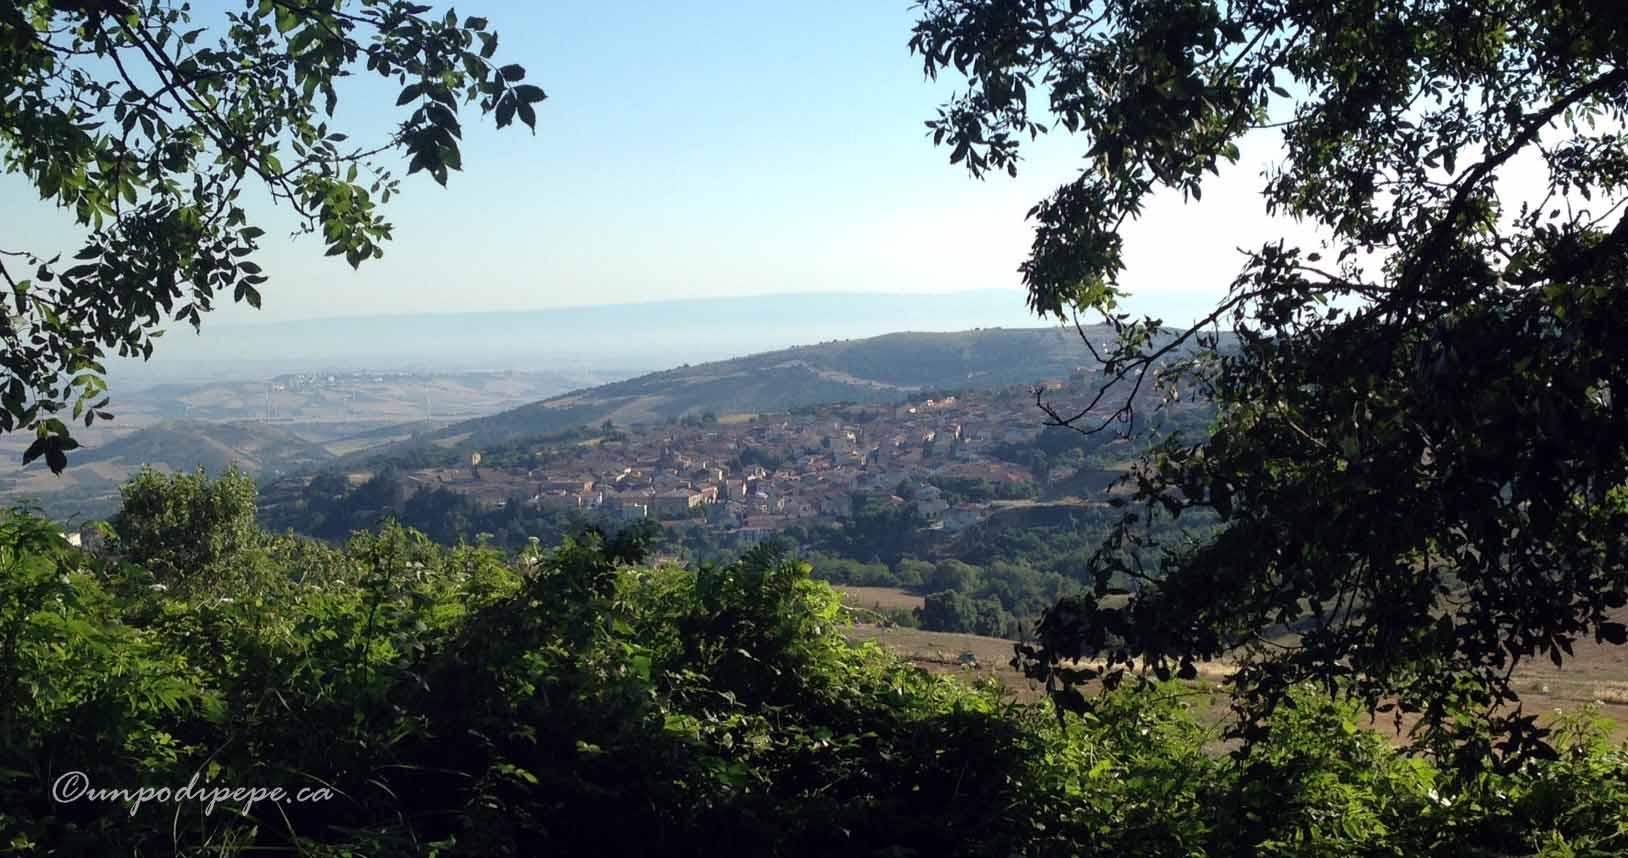 View of Orsara di Puglia